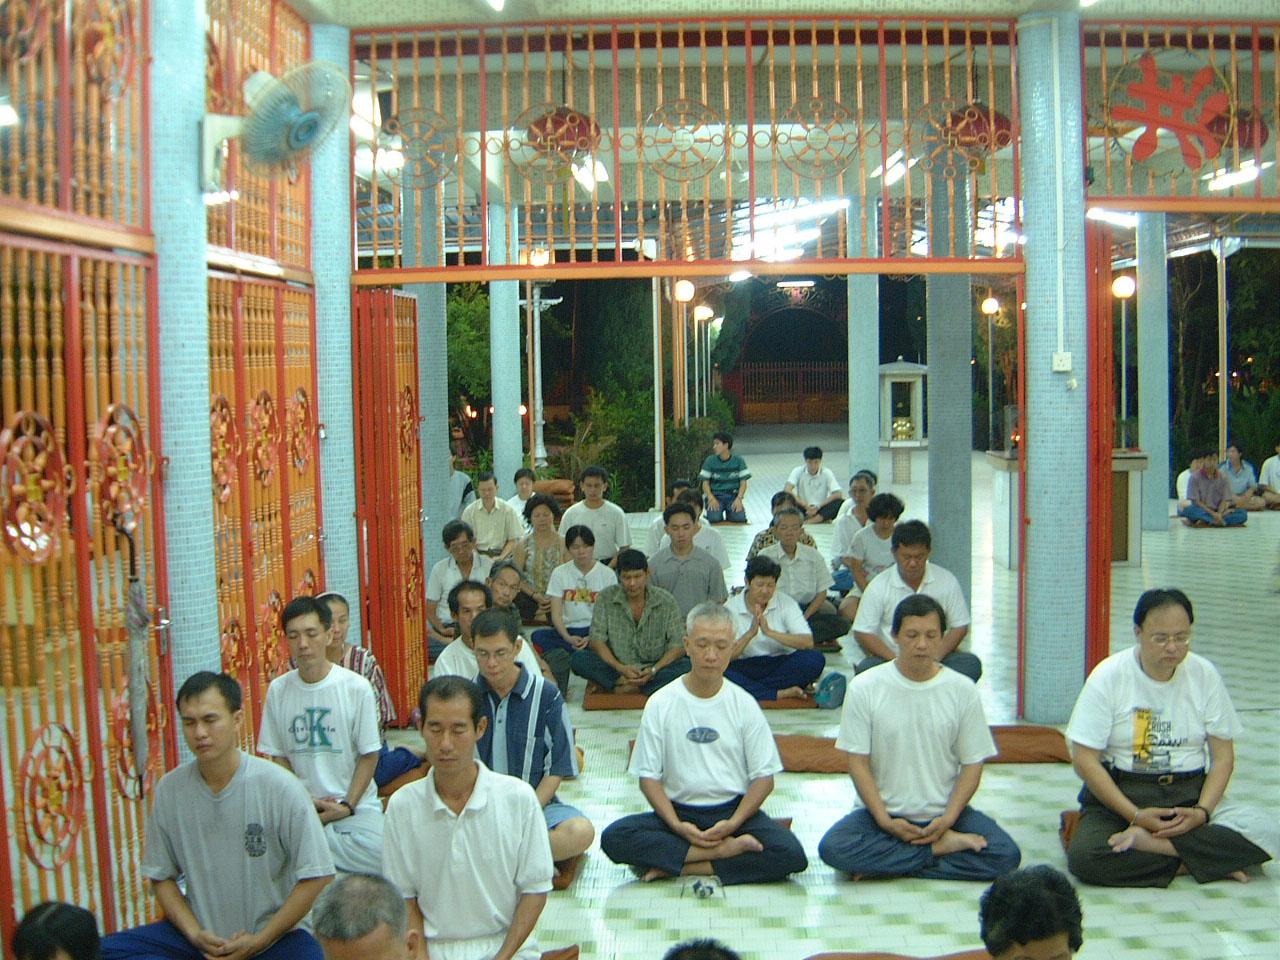 Penang Chinese Monastery Head Monk dharma talk 2001 02